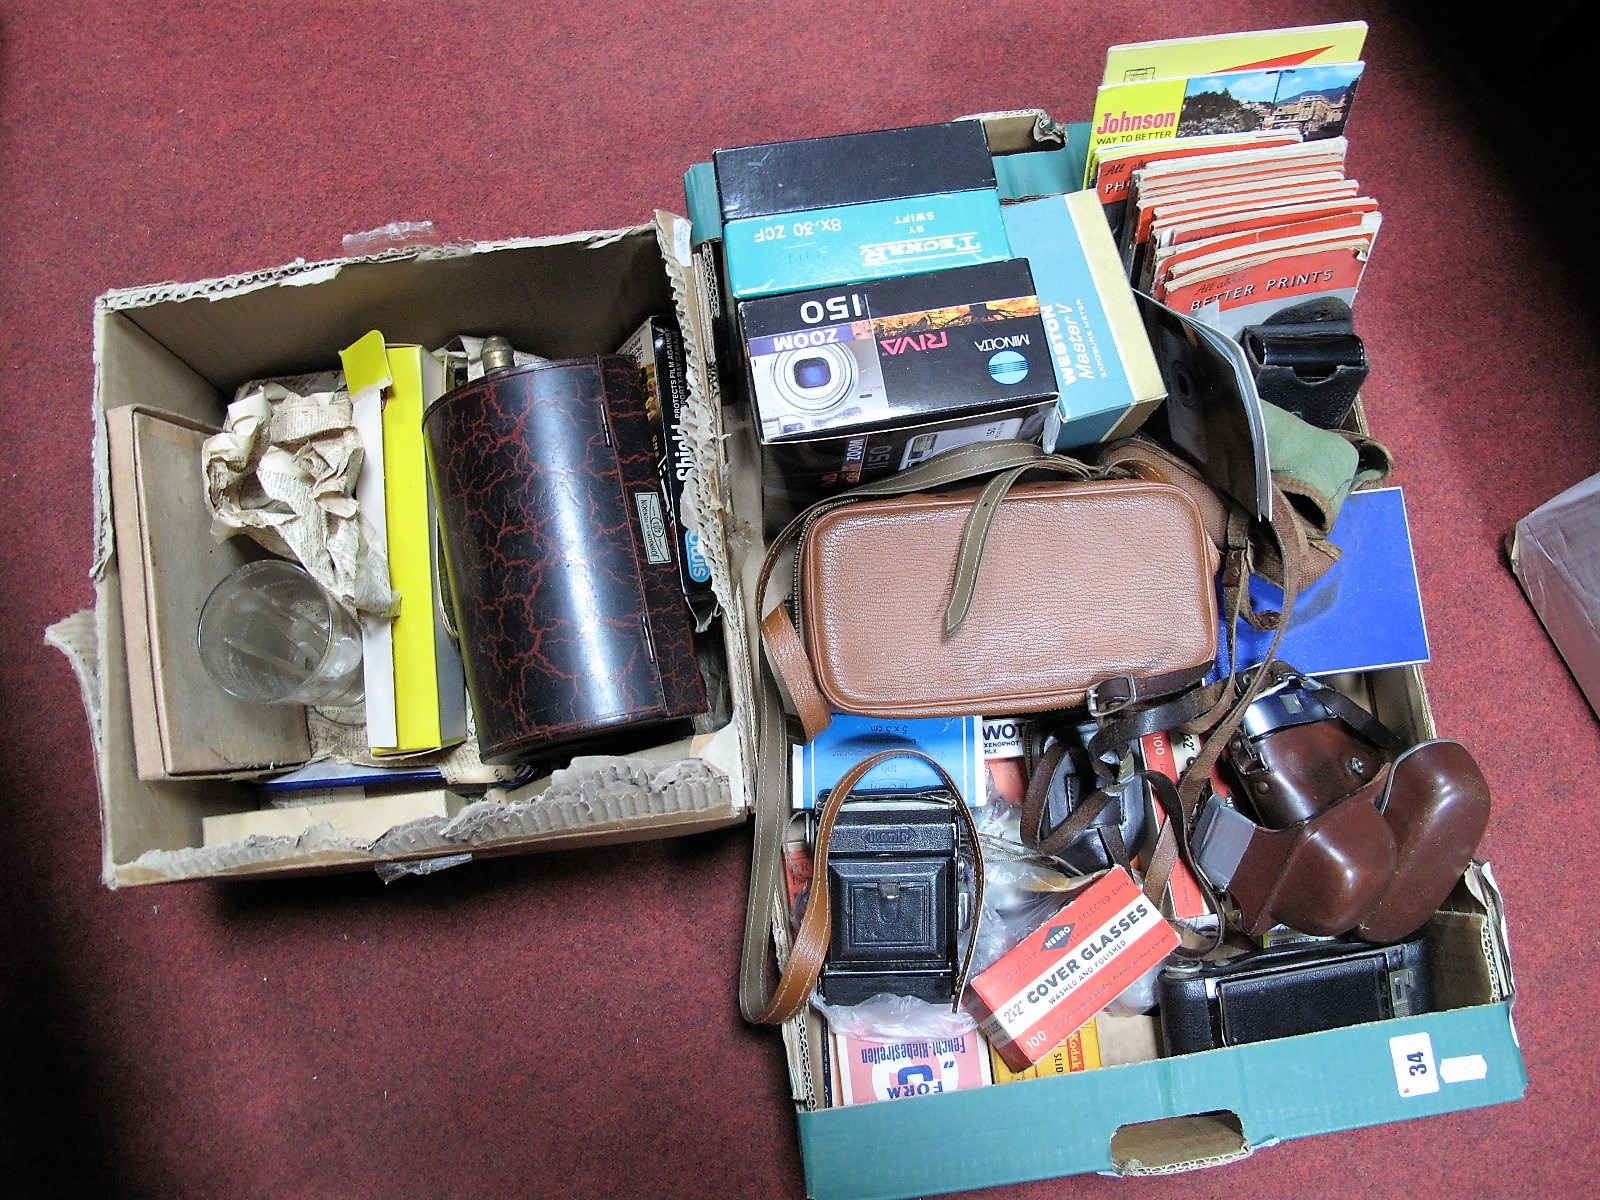 Lot 34 - A Voigtlander Vito B Camera, Minolta, Ikonta and Brownie examples, accessories, dark room safe